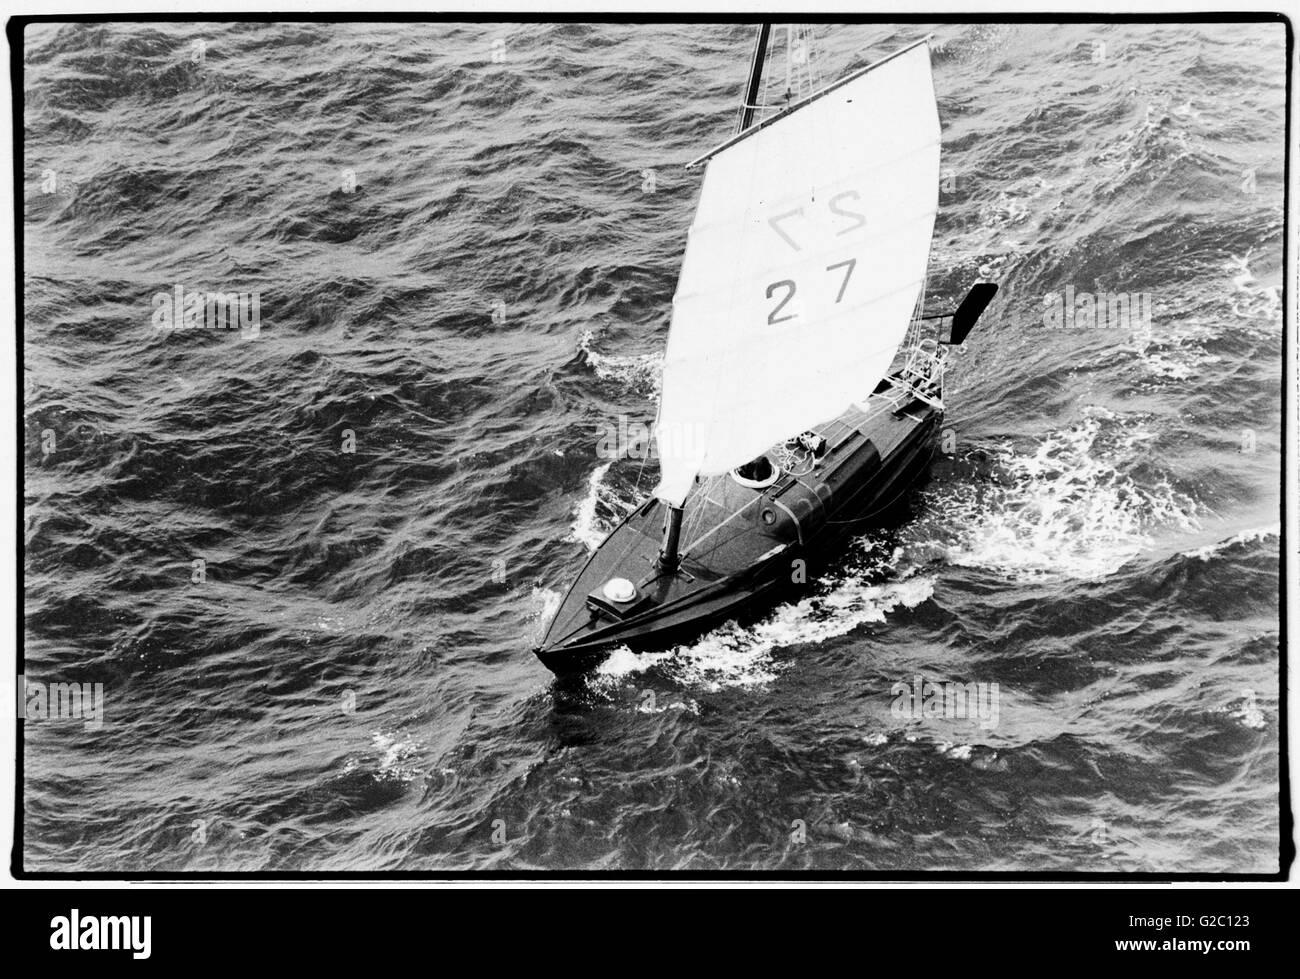 AJAX NEWS PHOTOS 1980 PLYMOUTHENGLAND